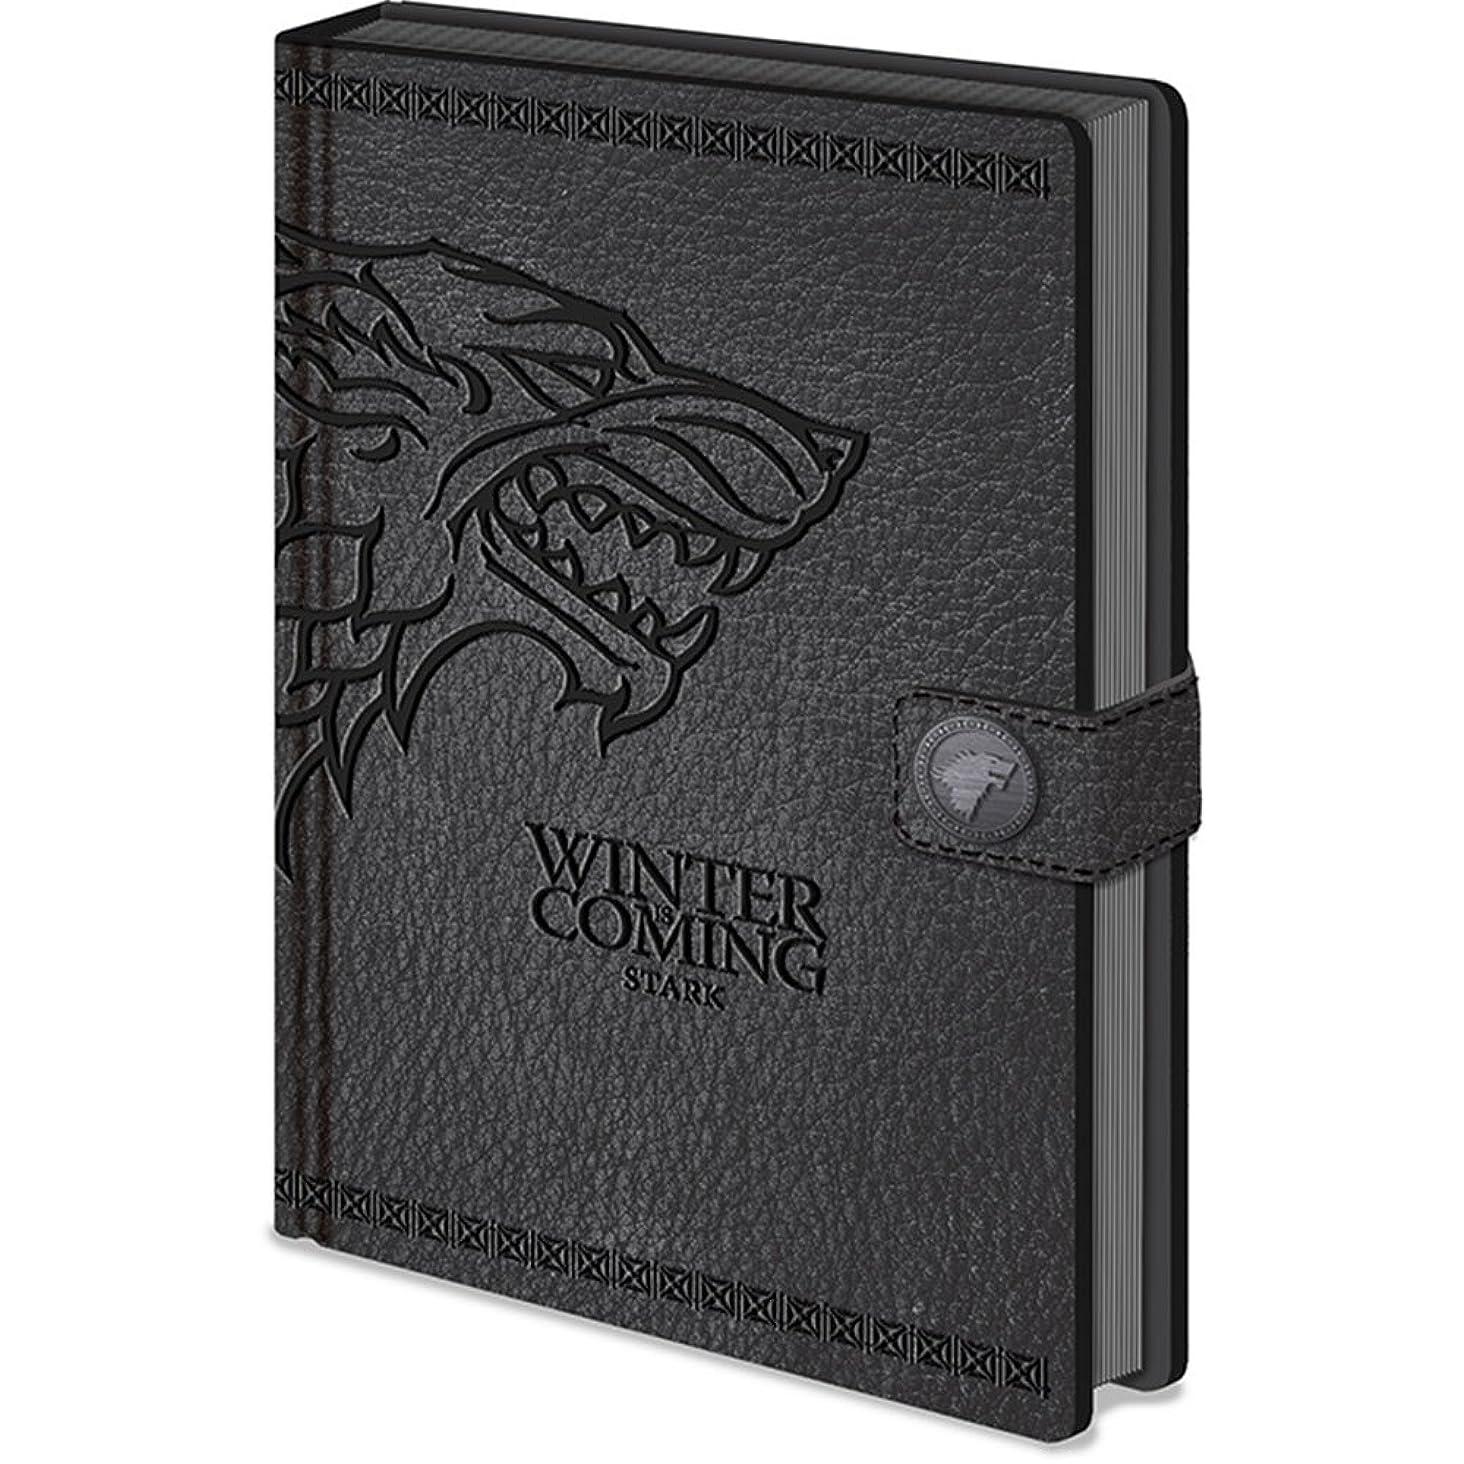 GAME OF THRONES ゲーム?オブ?スローンズ - Stark Premium A5 Notebook/ノート 【公式/オフィシャル】